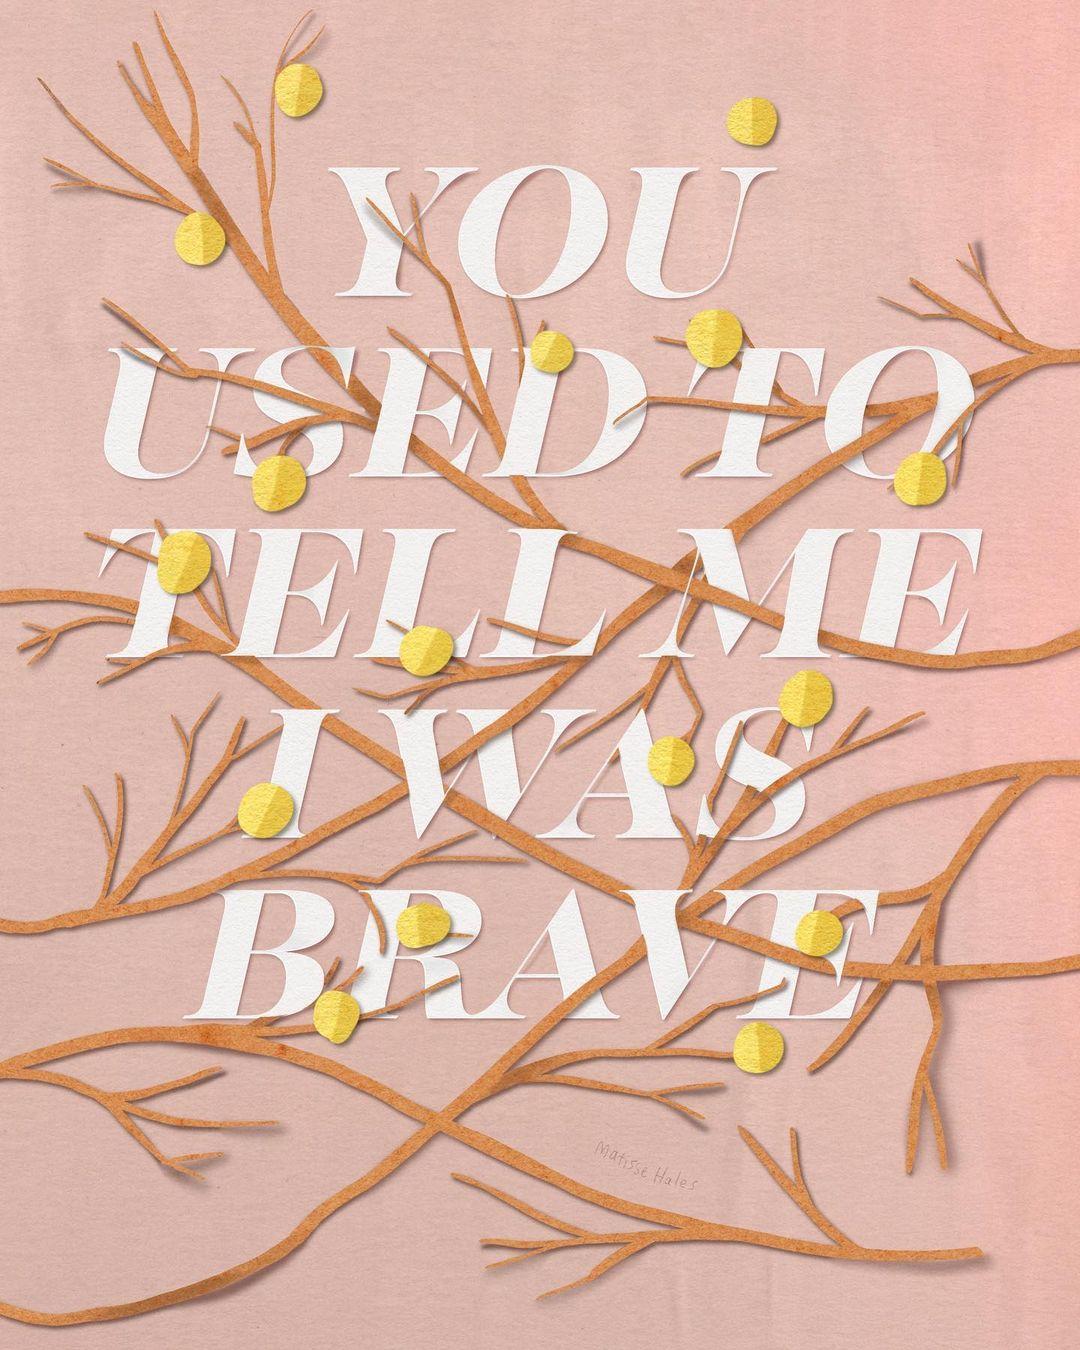 Paper Artist Matisse Hales' Work Spreads A Positive Message